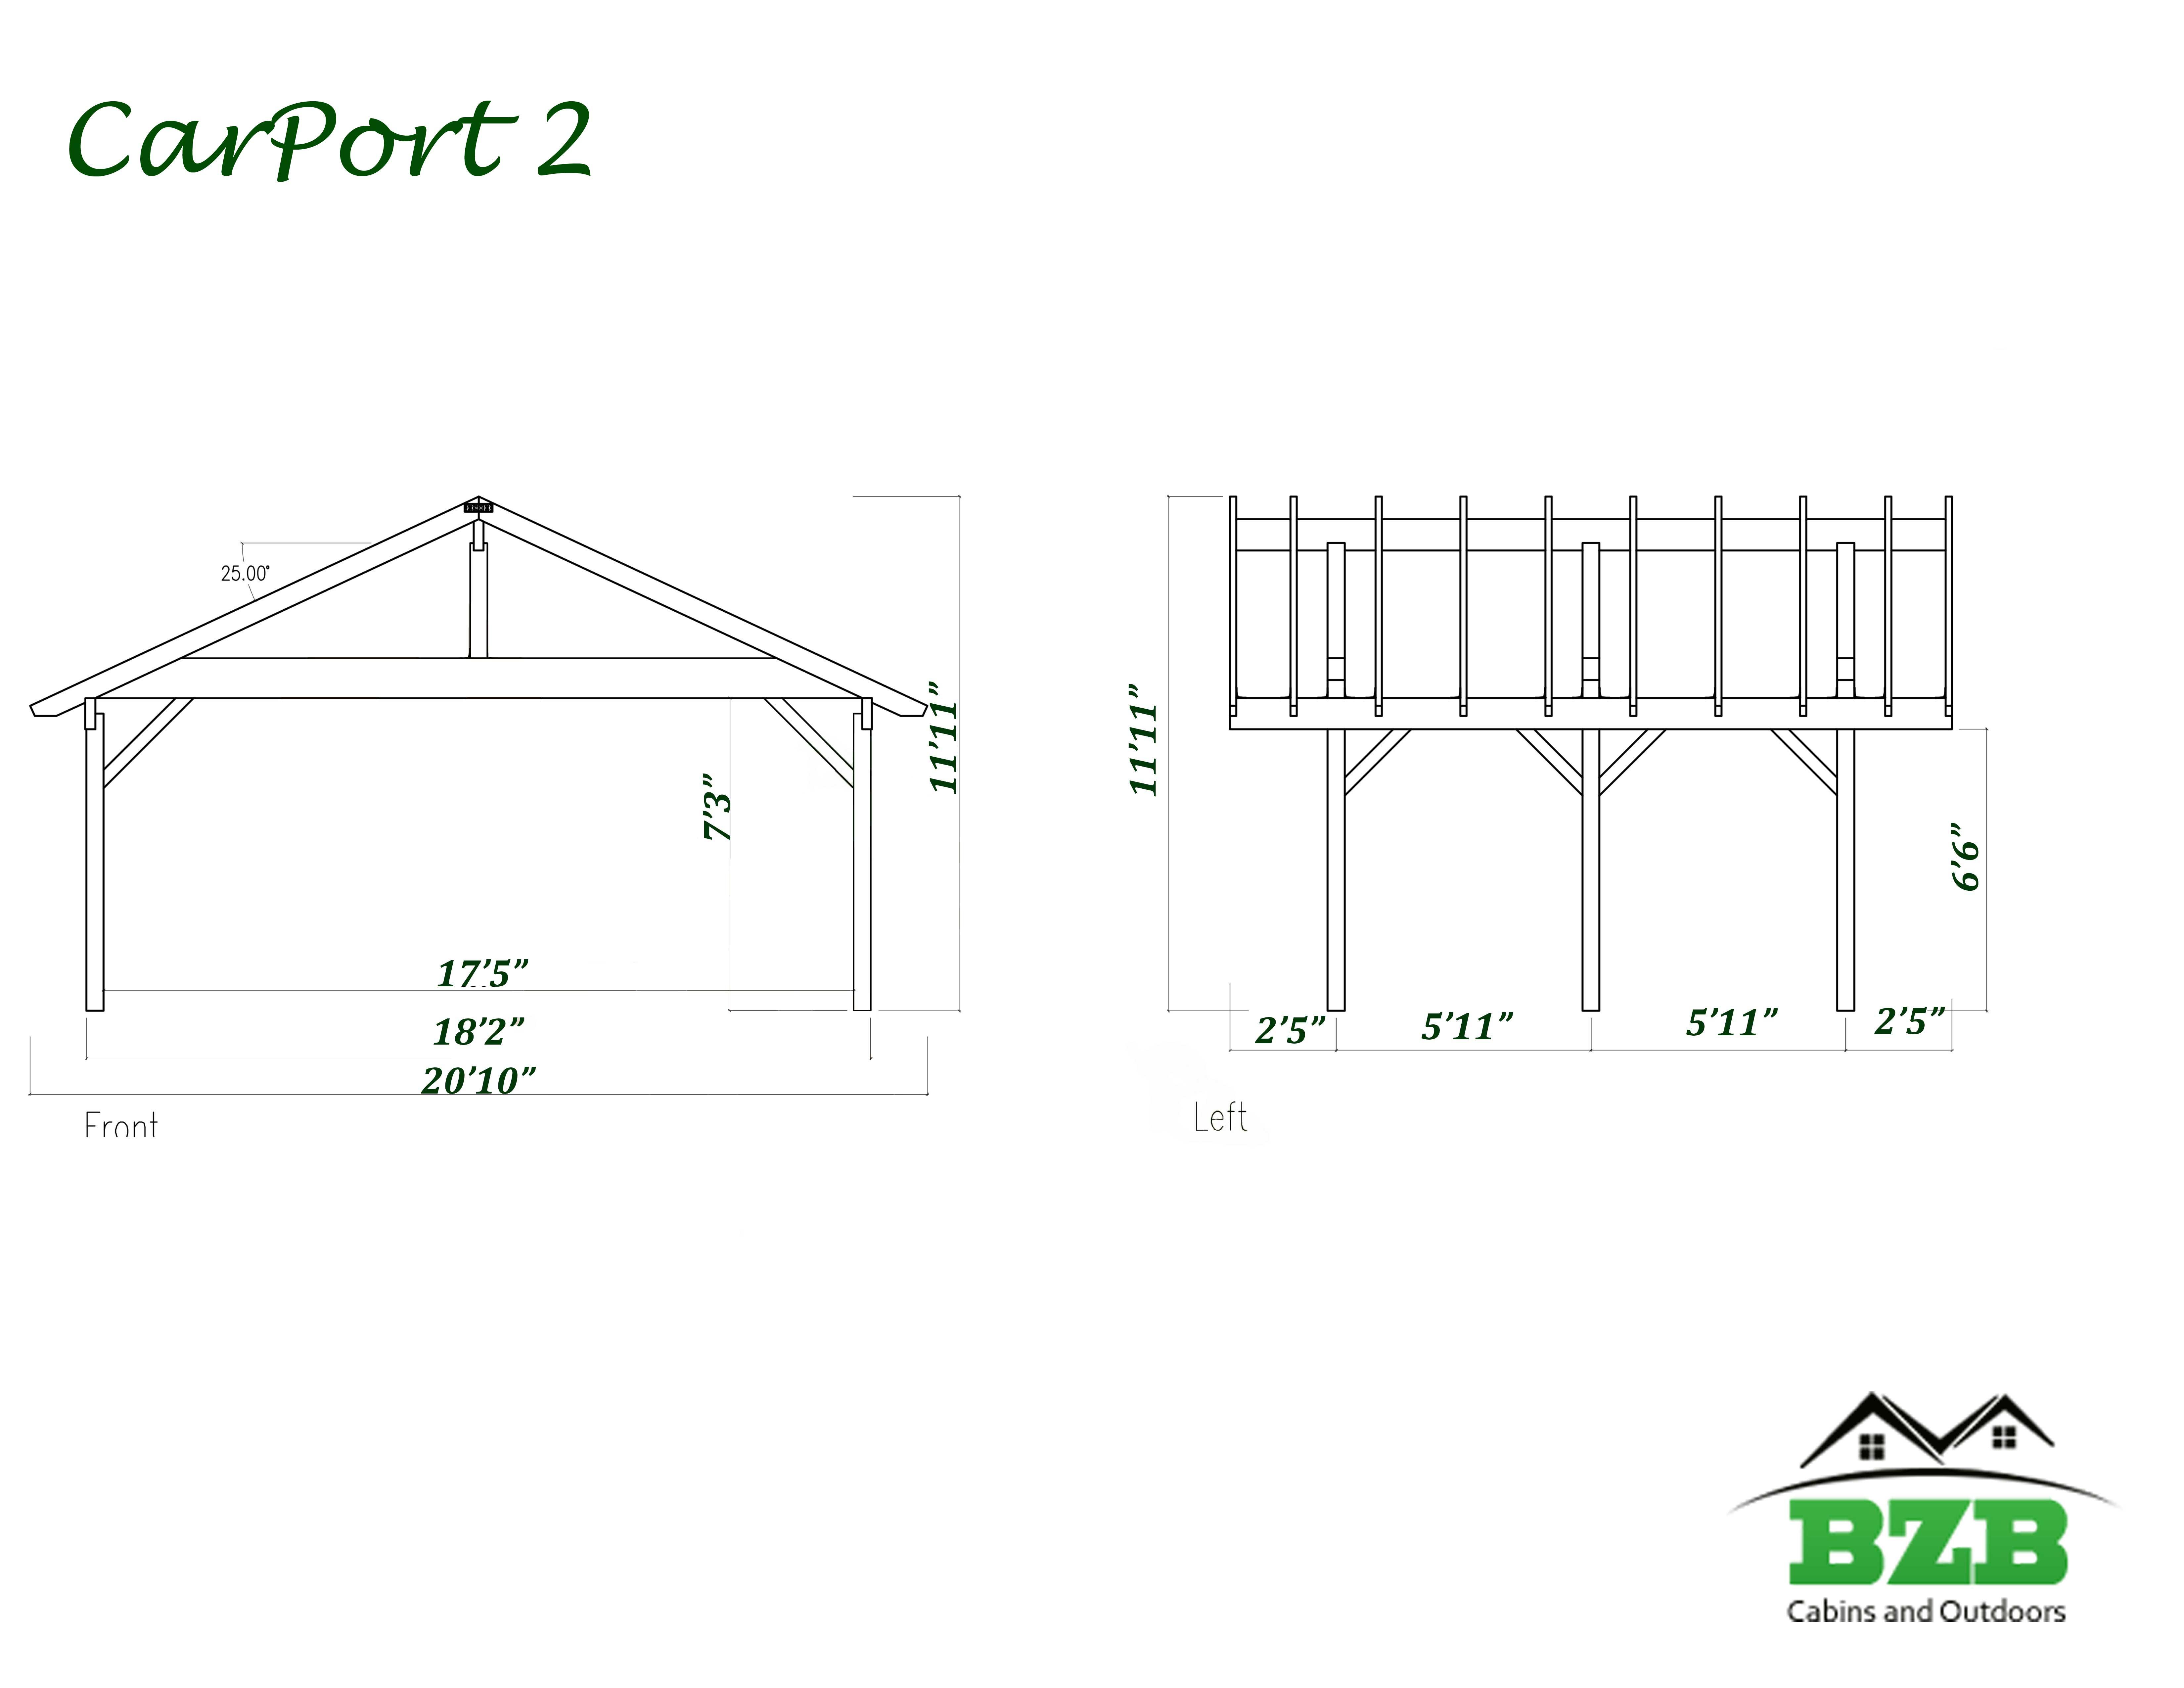 3 Car Carport Dimensions : Carports for sale bzbcabinsandoutdoors